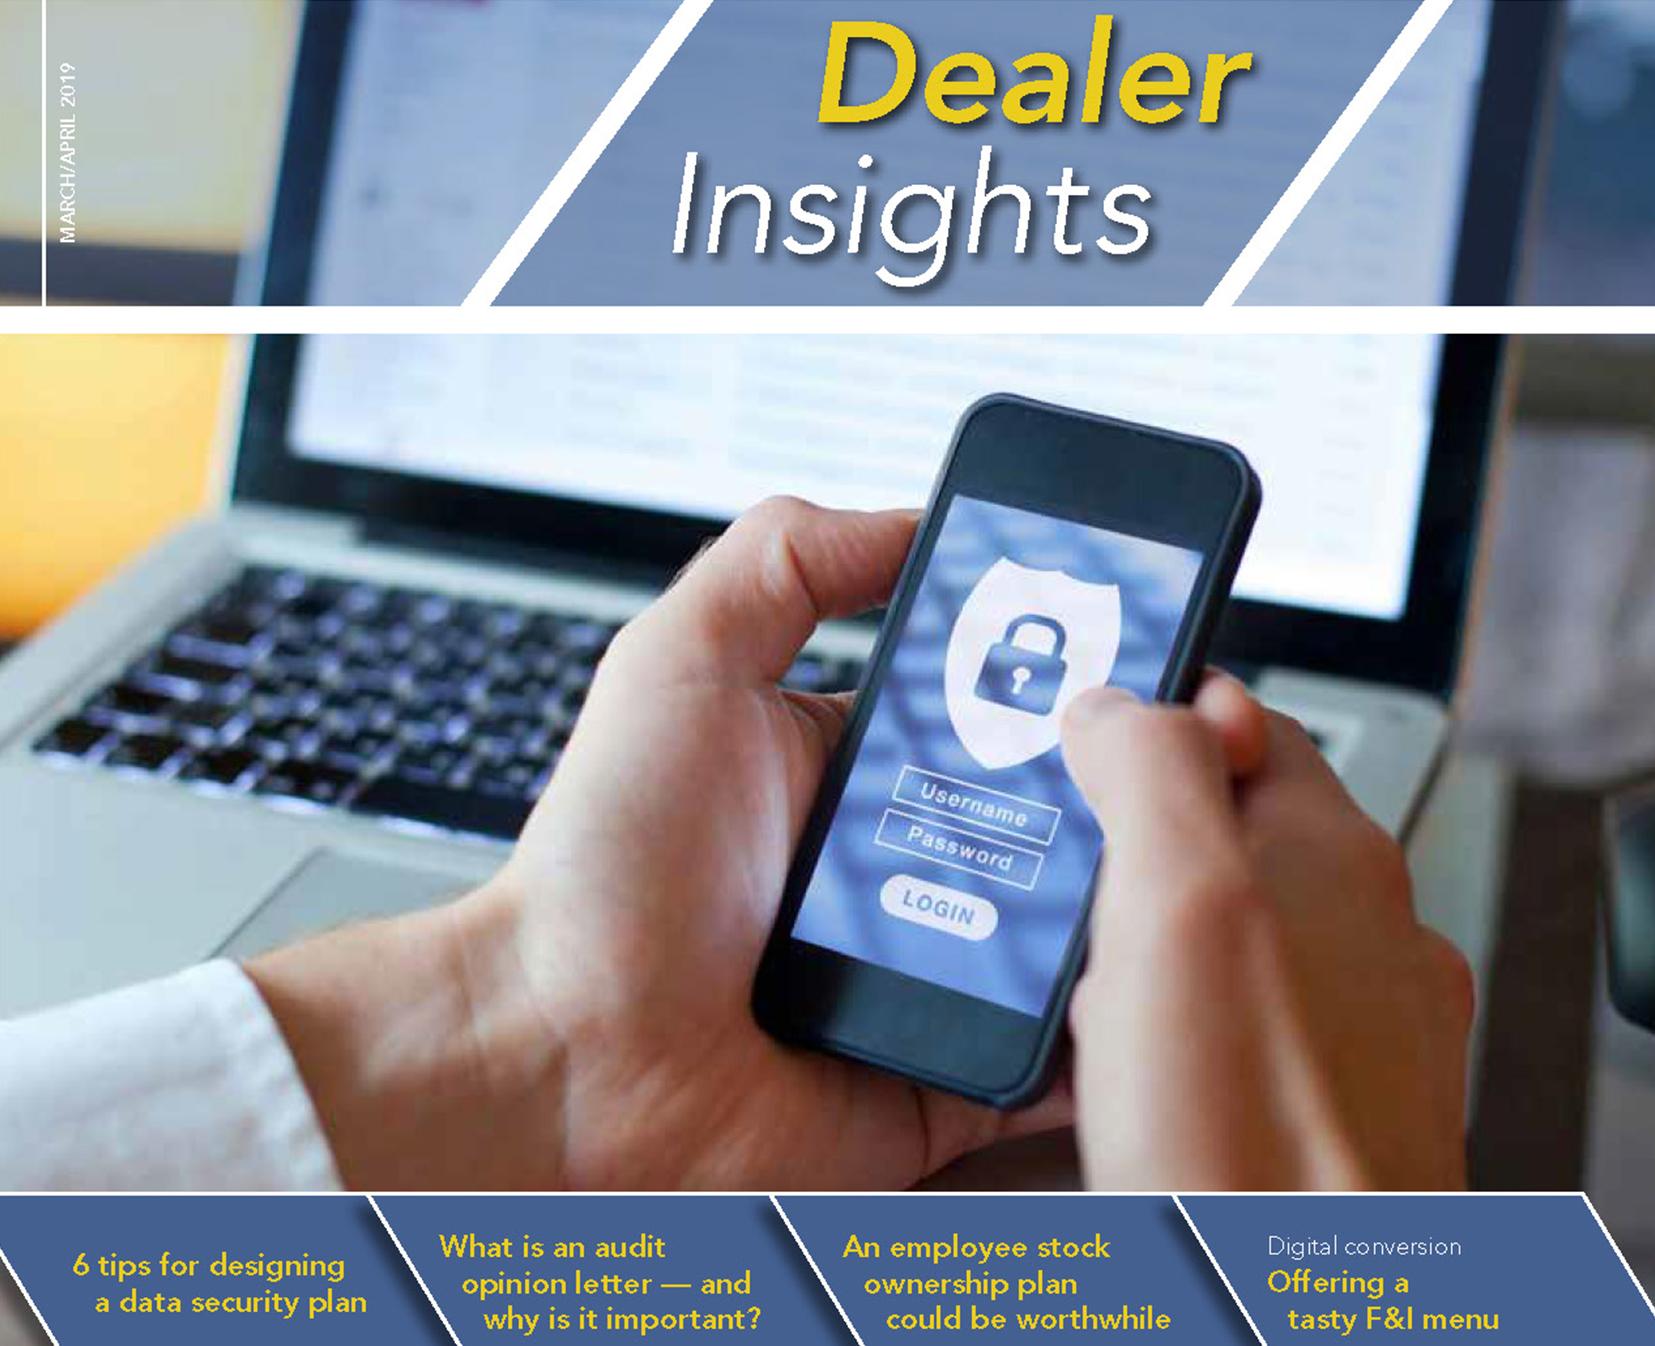 Dealer Insights